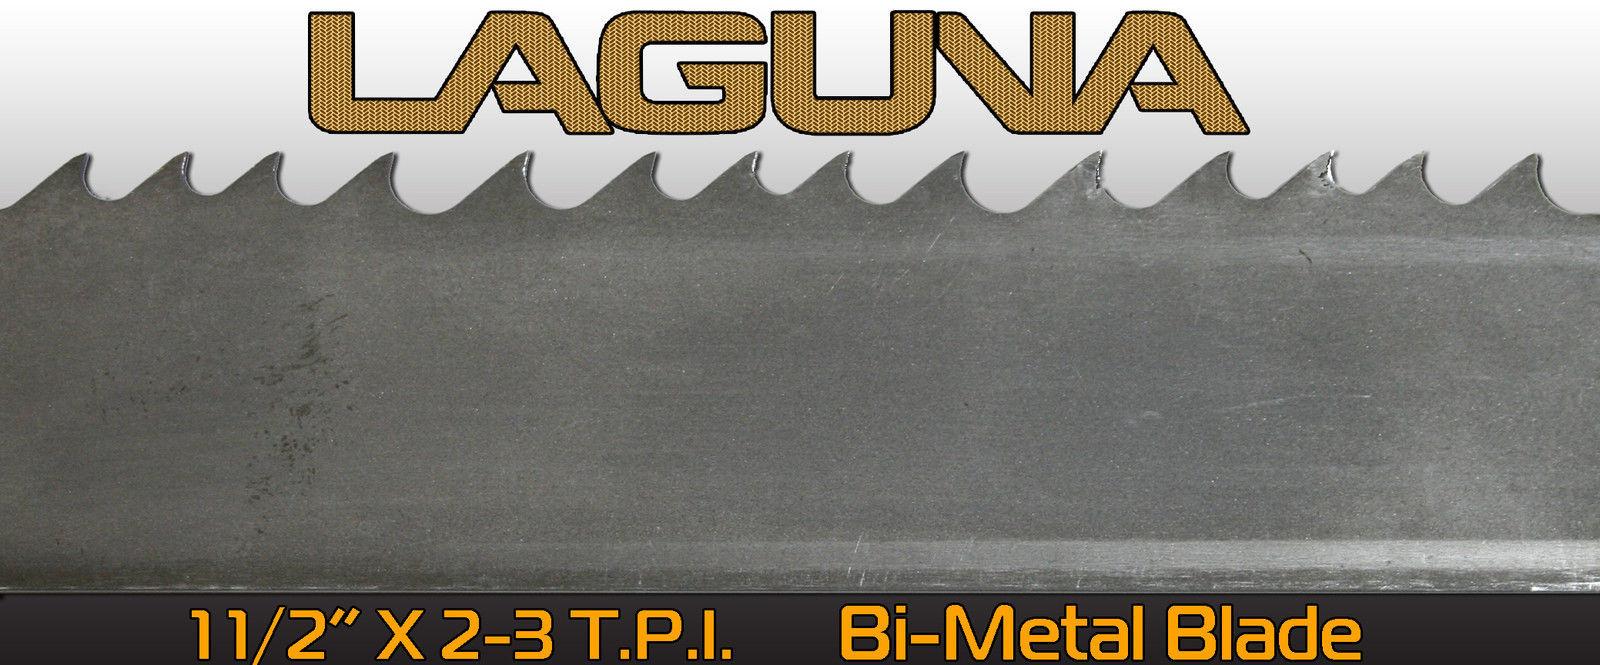 "1 1/2"" 2-3 TPI X 131 1/2"" Bimetal BandSaw Blade Laguna Tools Metal Cutting Blade"